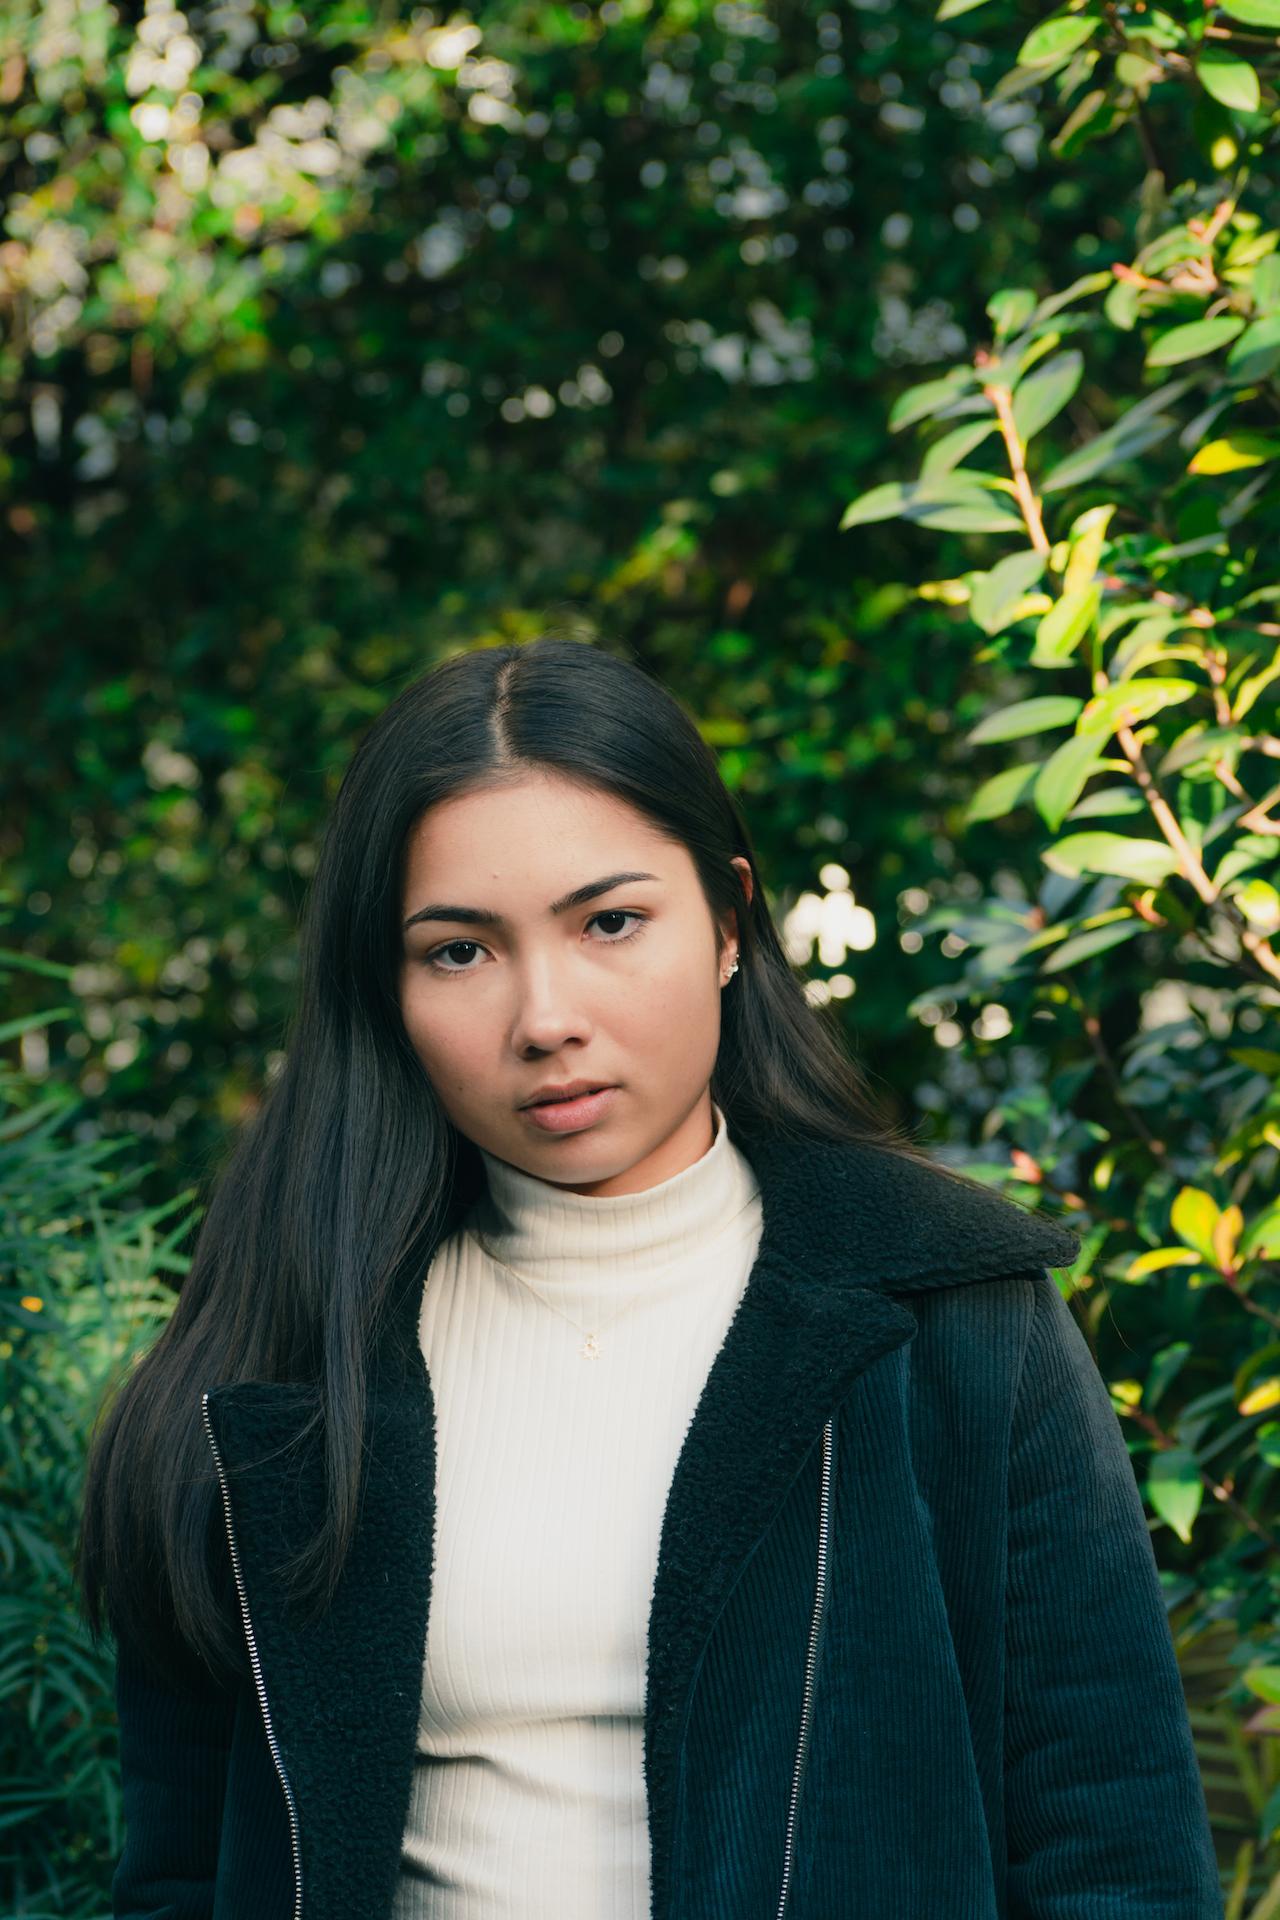 LisaKnightPhoto-Lydia9.jpg